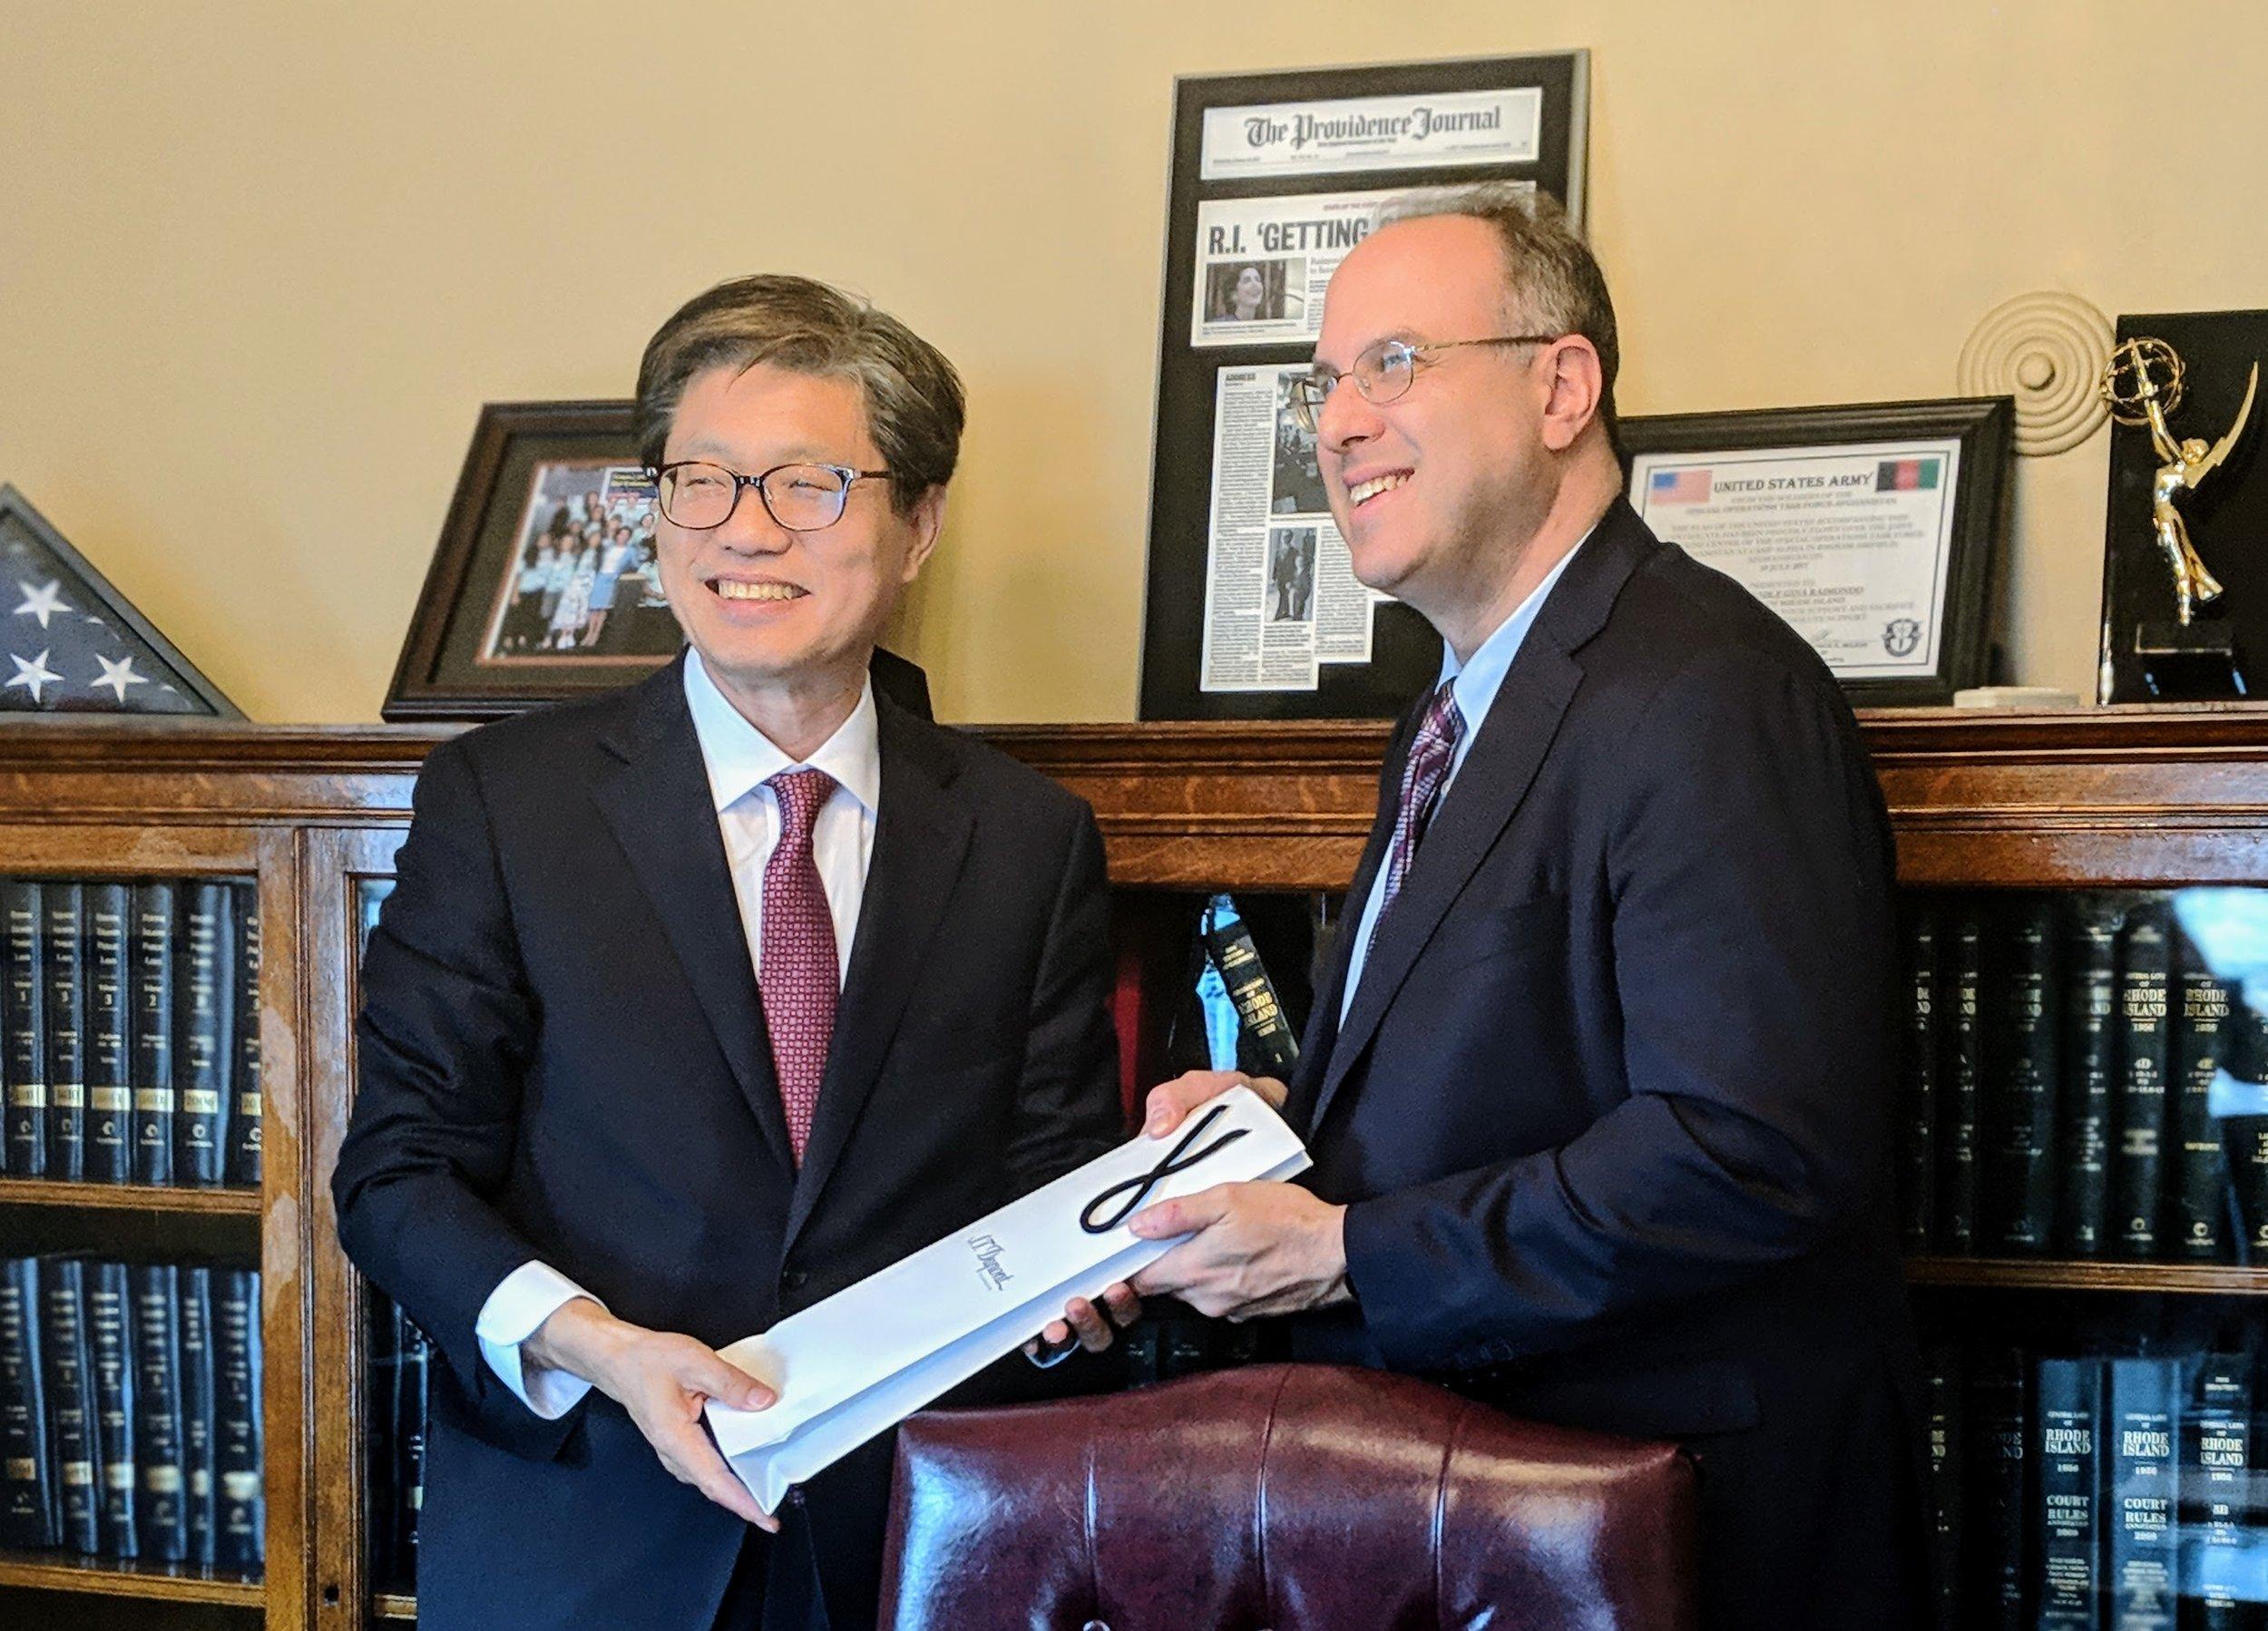 Deog-Seong Oh, Ph.D., President of Chungnam National University and Stefan Pryor, Rhode Island Secretary of Commerce